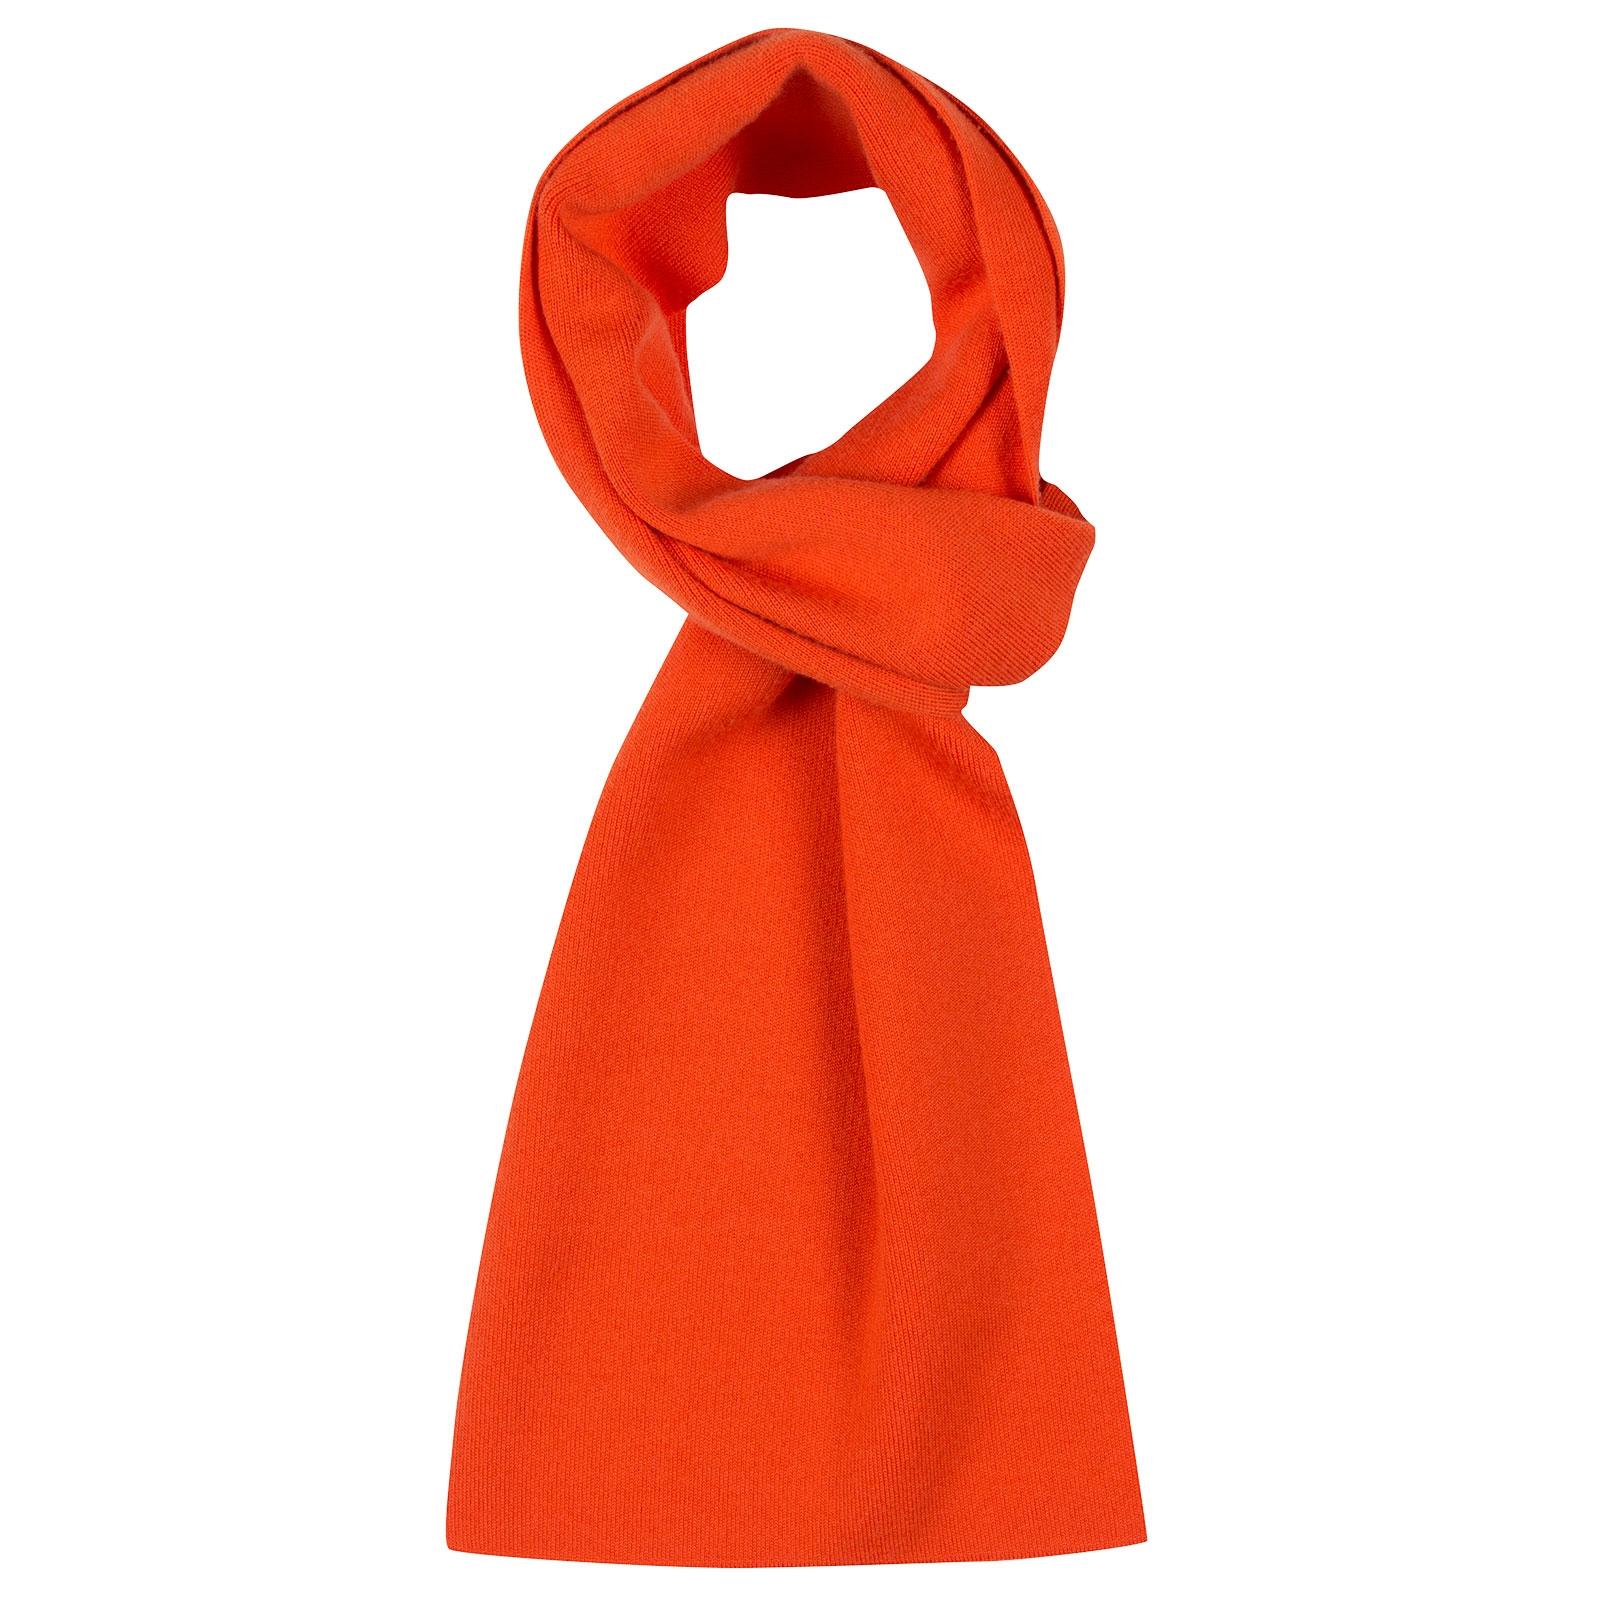 John Smedley pintail Merino Wool Scarf in Blaze Orange-ONE